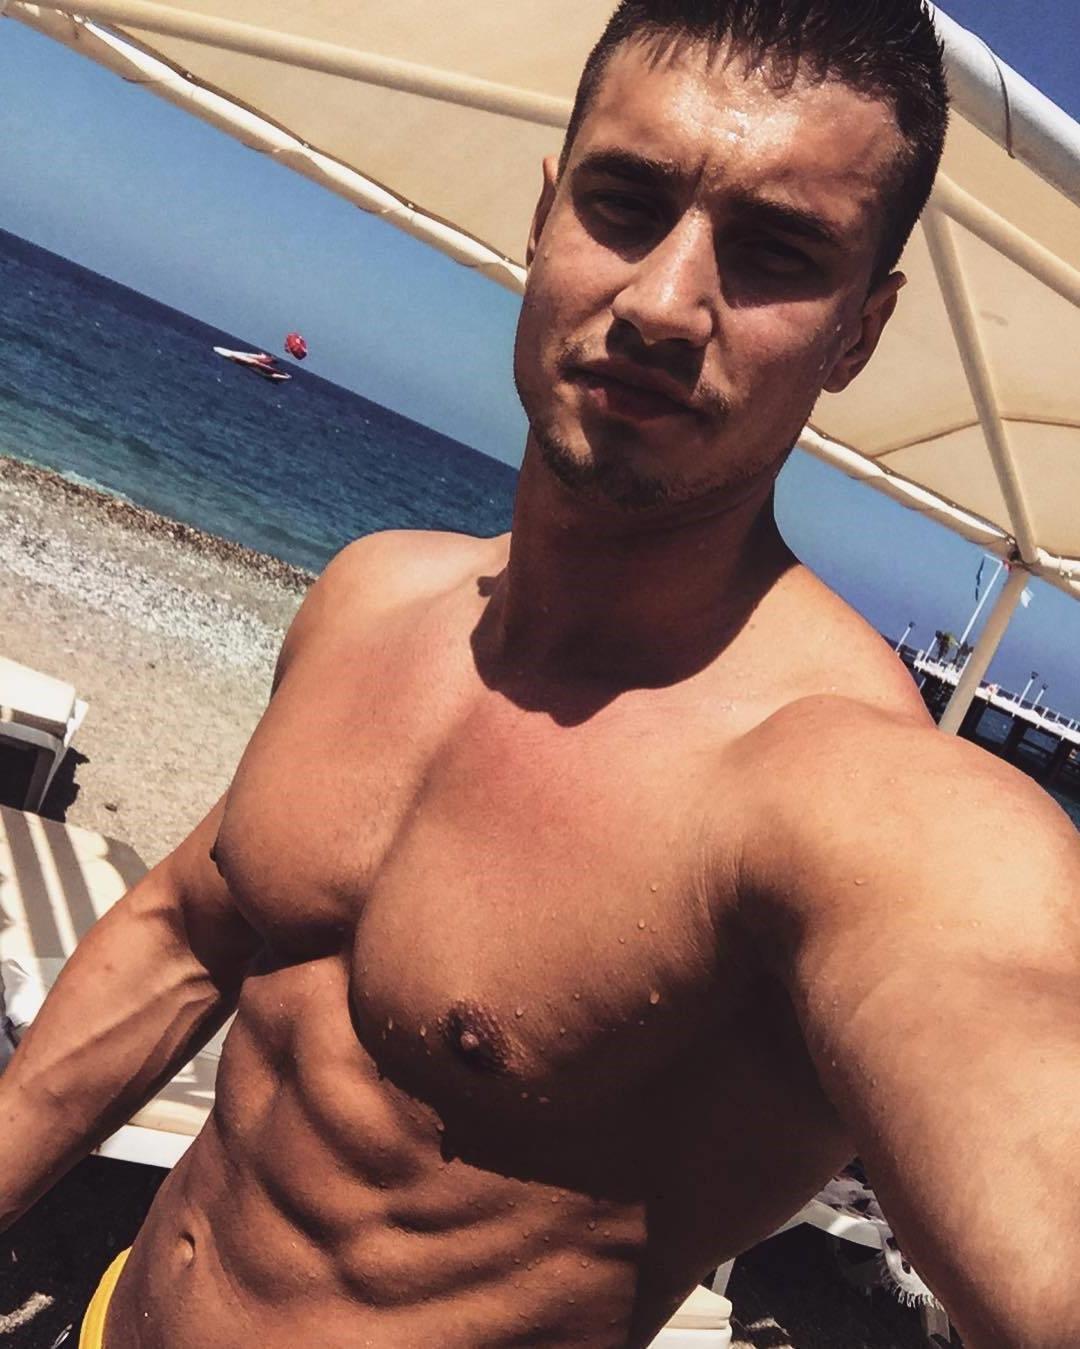 hot-russian-guys-aleks-kalmykov-shirtless-selfie-fit-beach-body